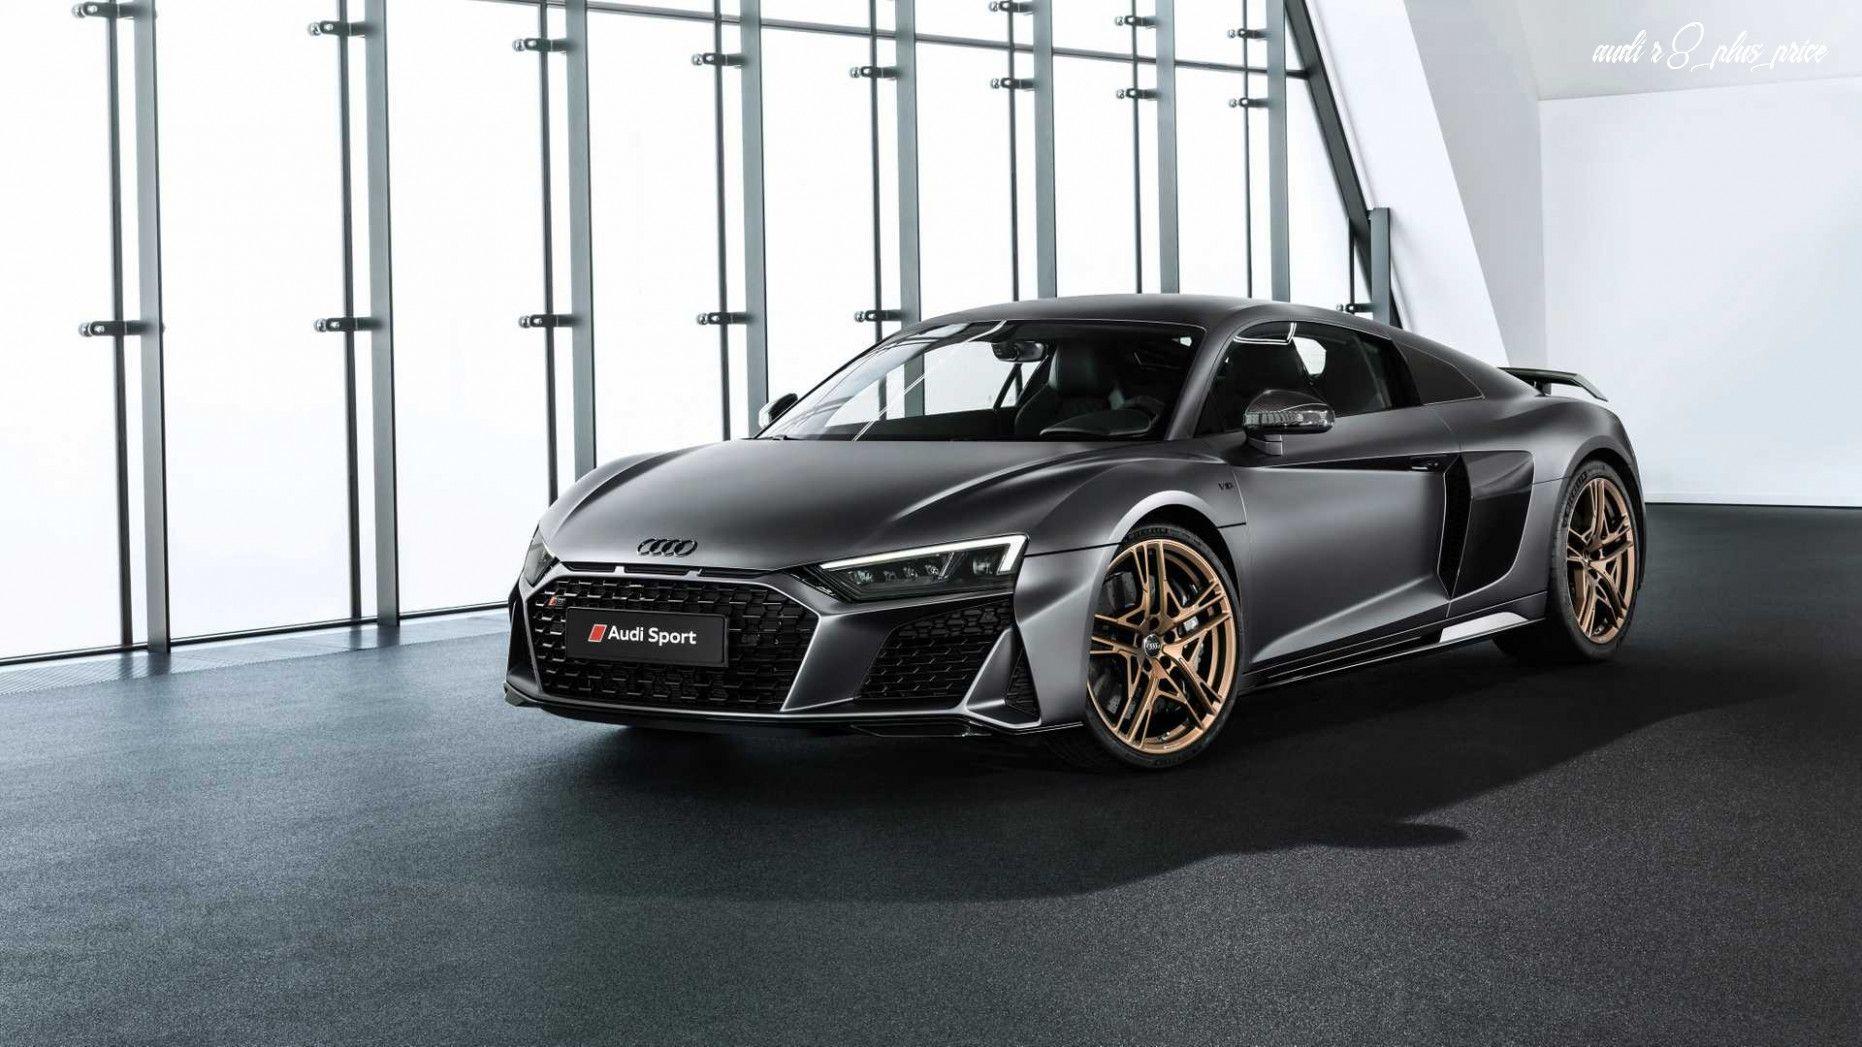 Audi R8 Plus Price Price And Review En 2020 Audi R8 V10 Audi R8 Audi